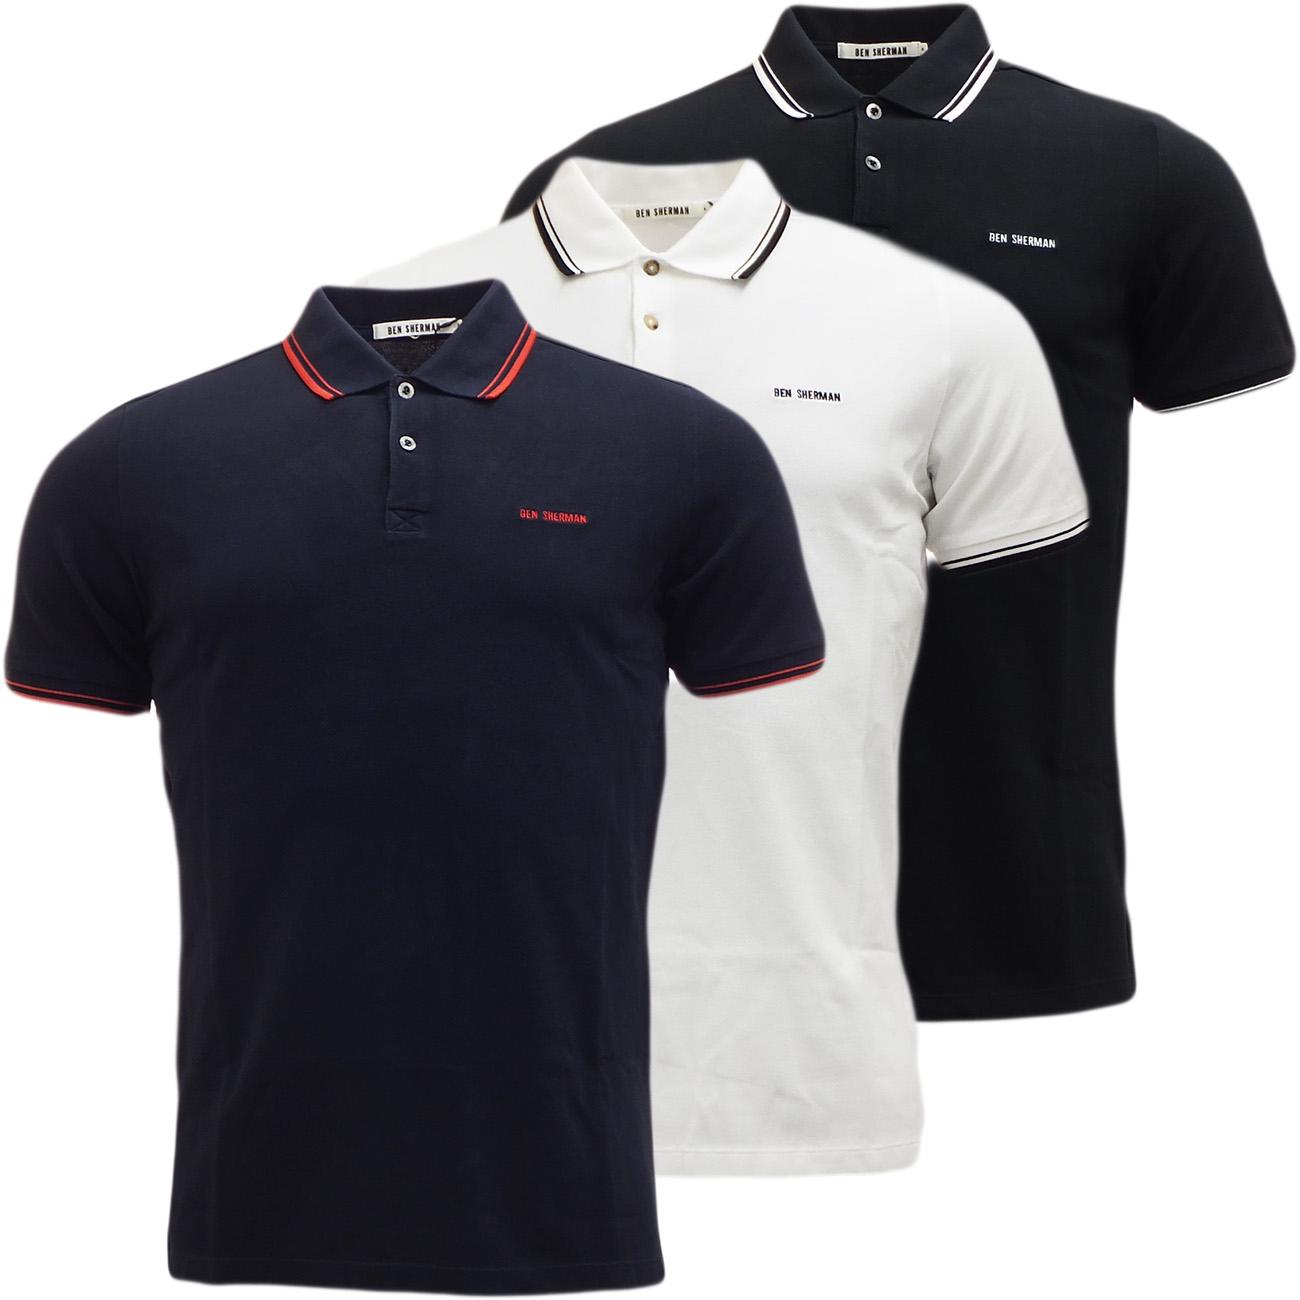 57231f20 Sentinel Ben Sherman Plain Polo Shirt Mens Polos / Short Sleeve Shirts /  Designer Top